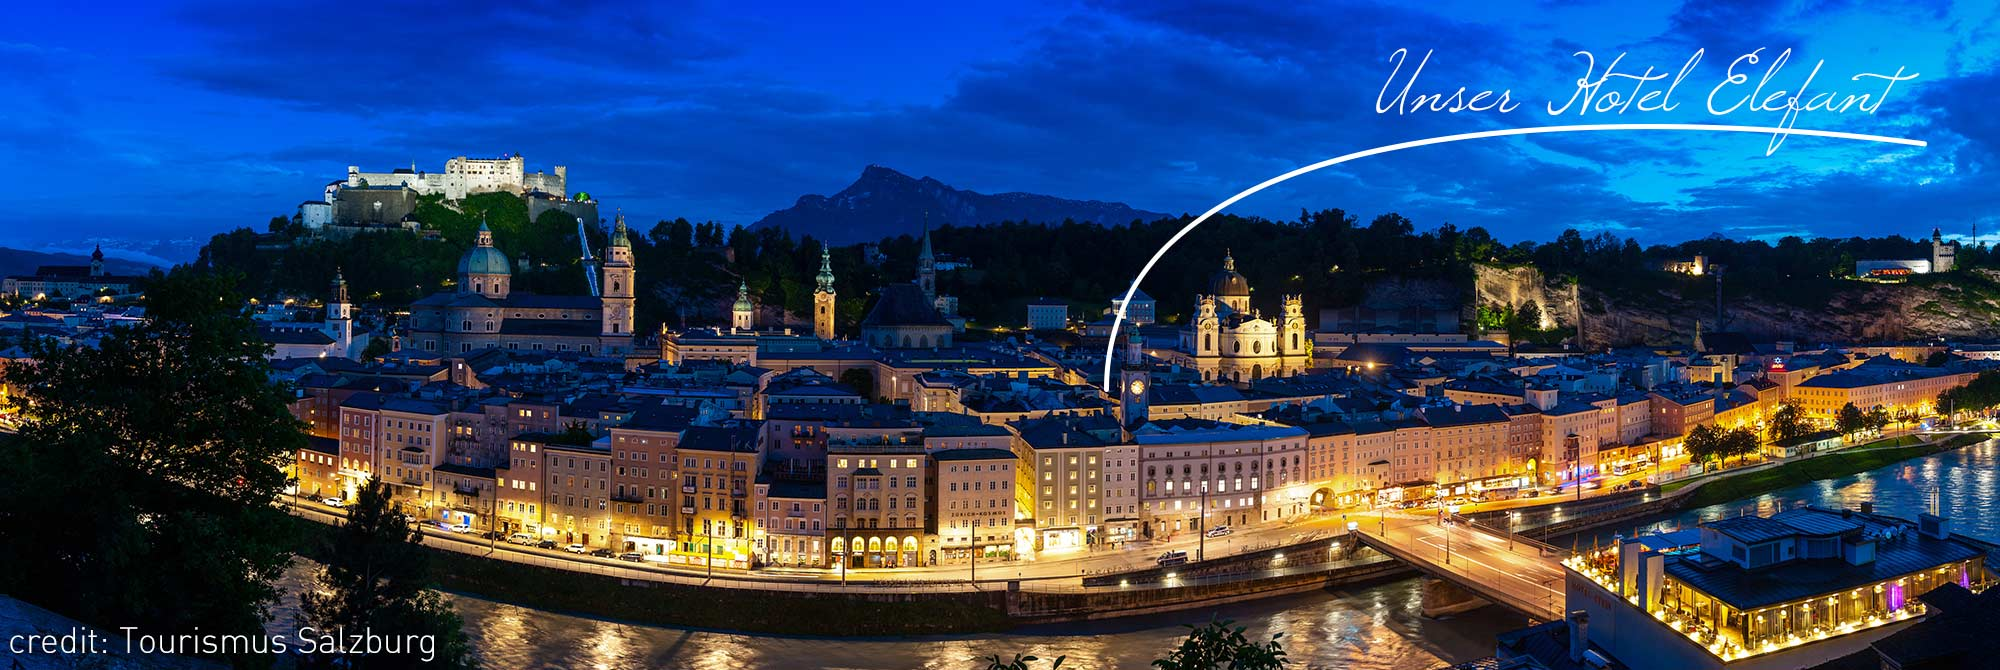 Hotel Elefant Zentrum Salzburg Altstadt bei Nacht